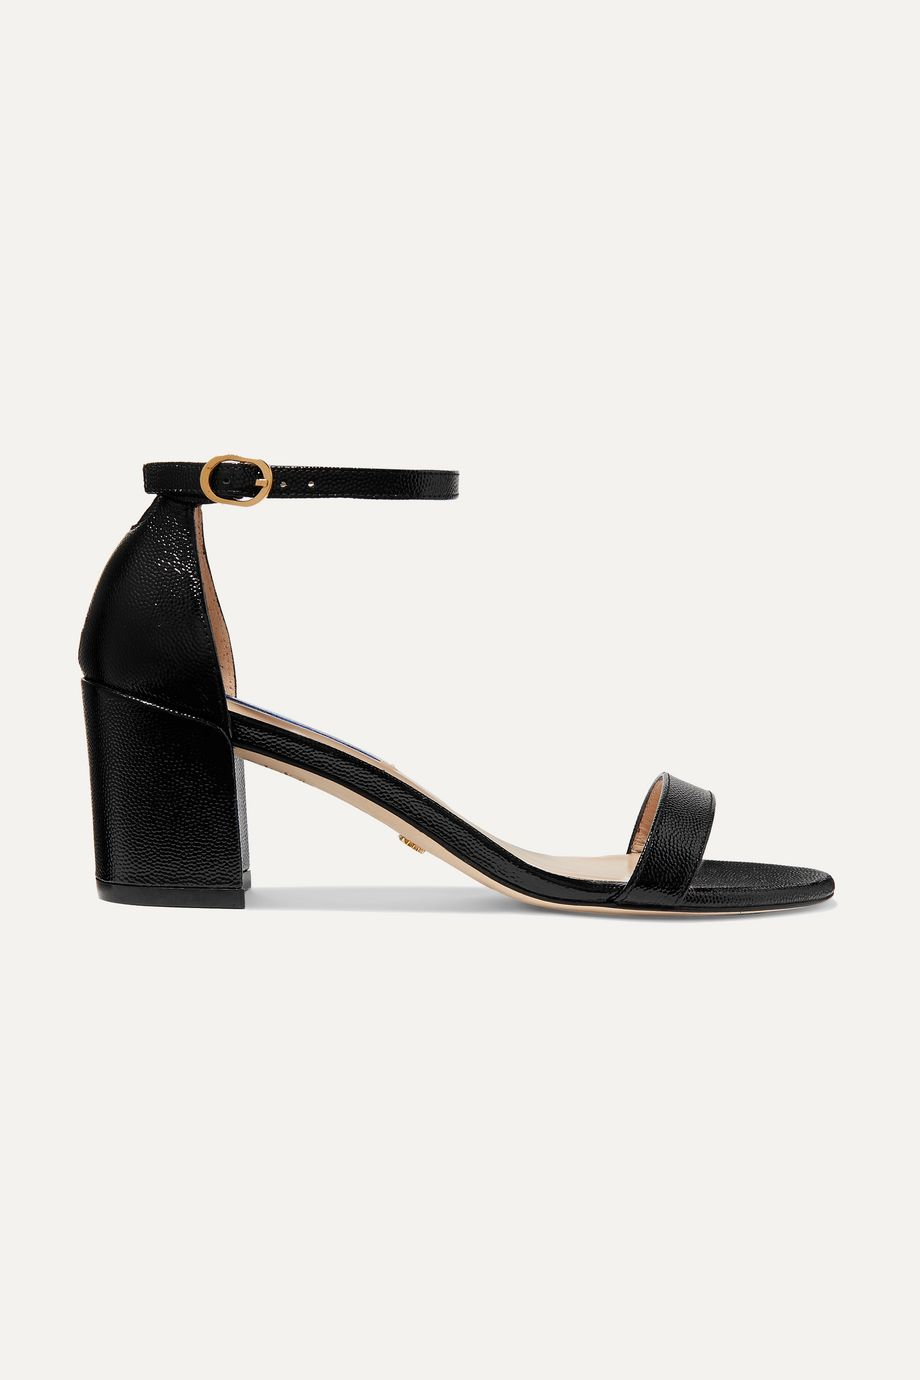 Stuart Weitzman Simple textured-leather sandals